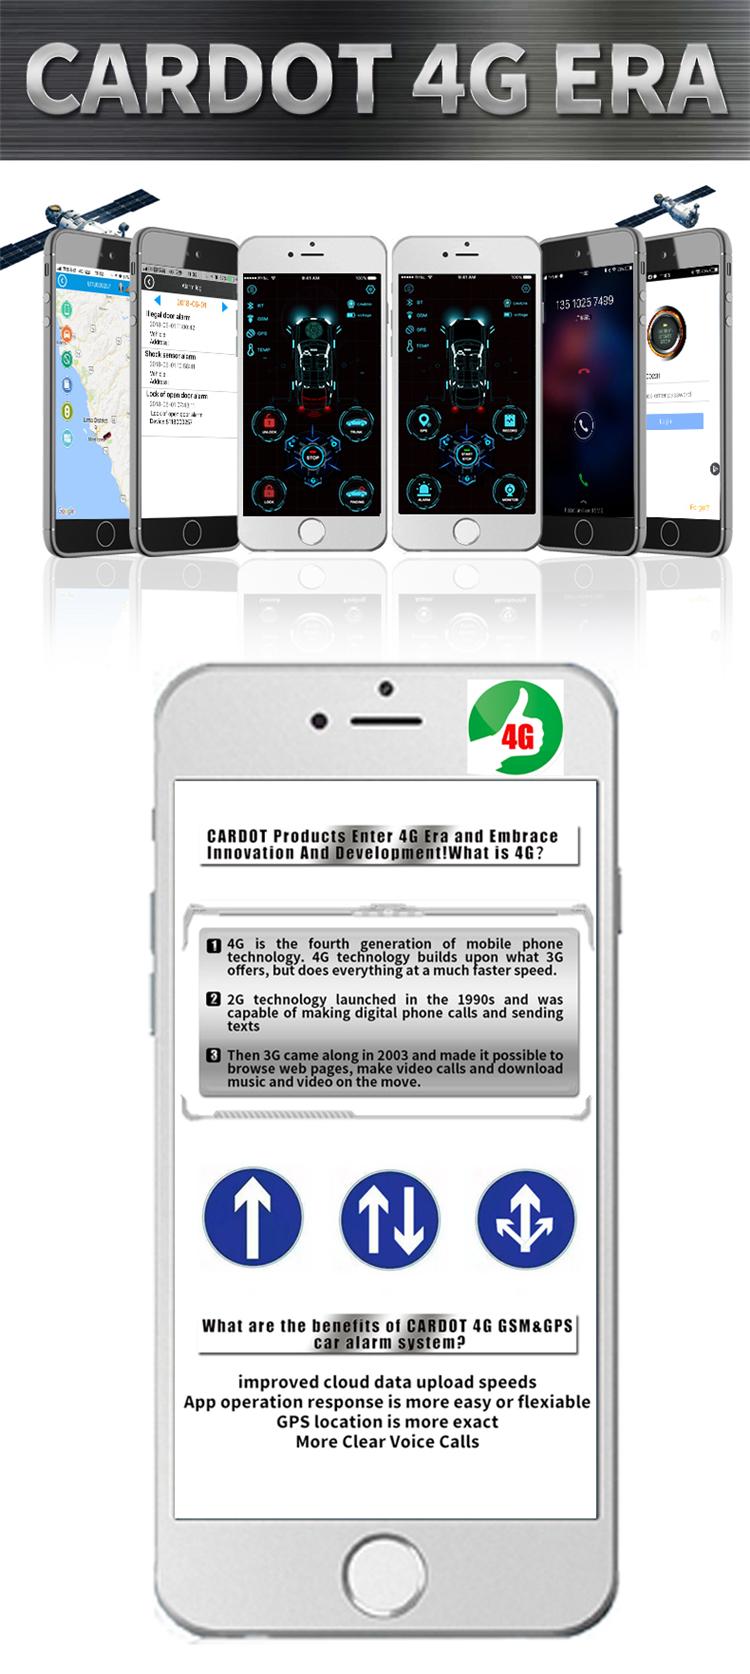 cardot 4G advantage.jpg